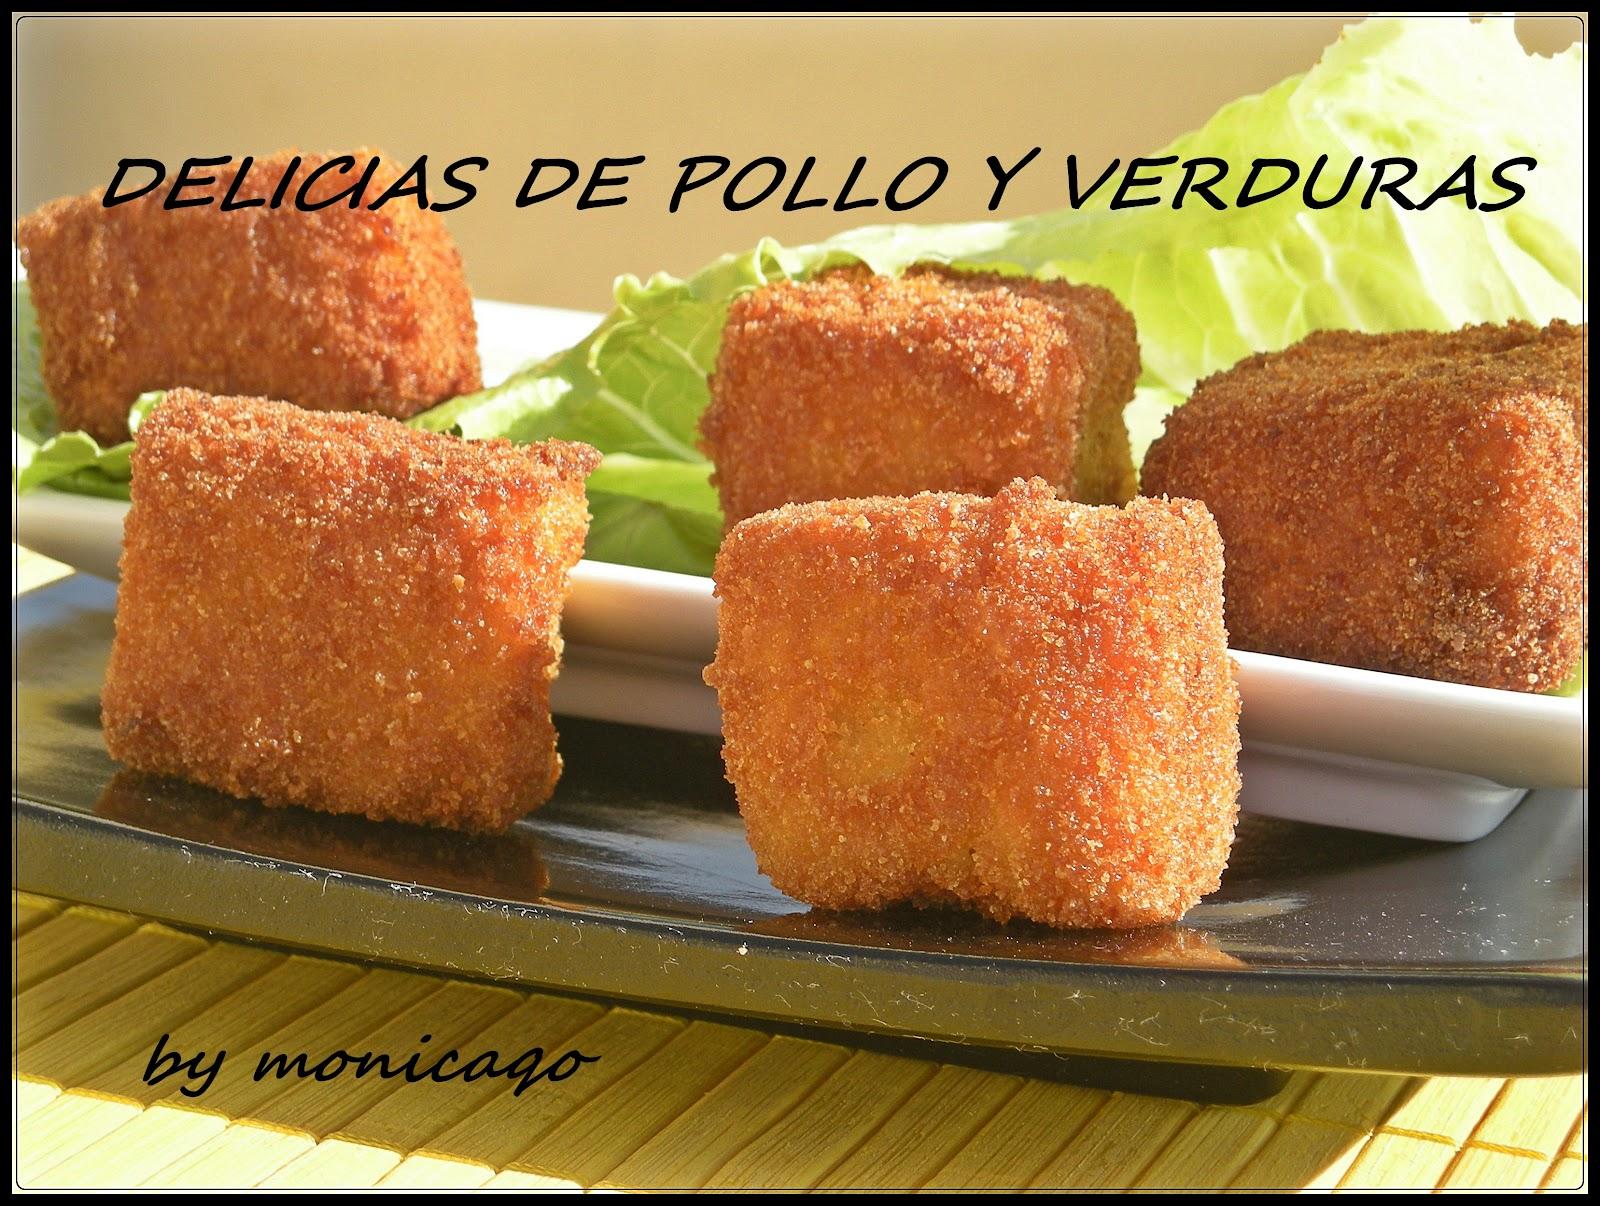 http://3.bp.blogspot.com/-GjpSSFuzN1w/UEIWNuJ49HI/AAAAAAAAAZU/-jZi287tv1U/s1600/delicias+de+verdura+y+pollo+2.JPG